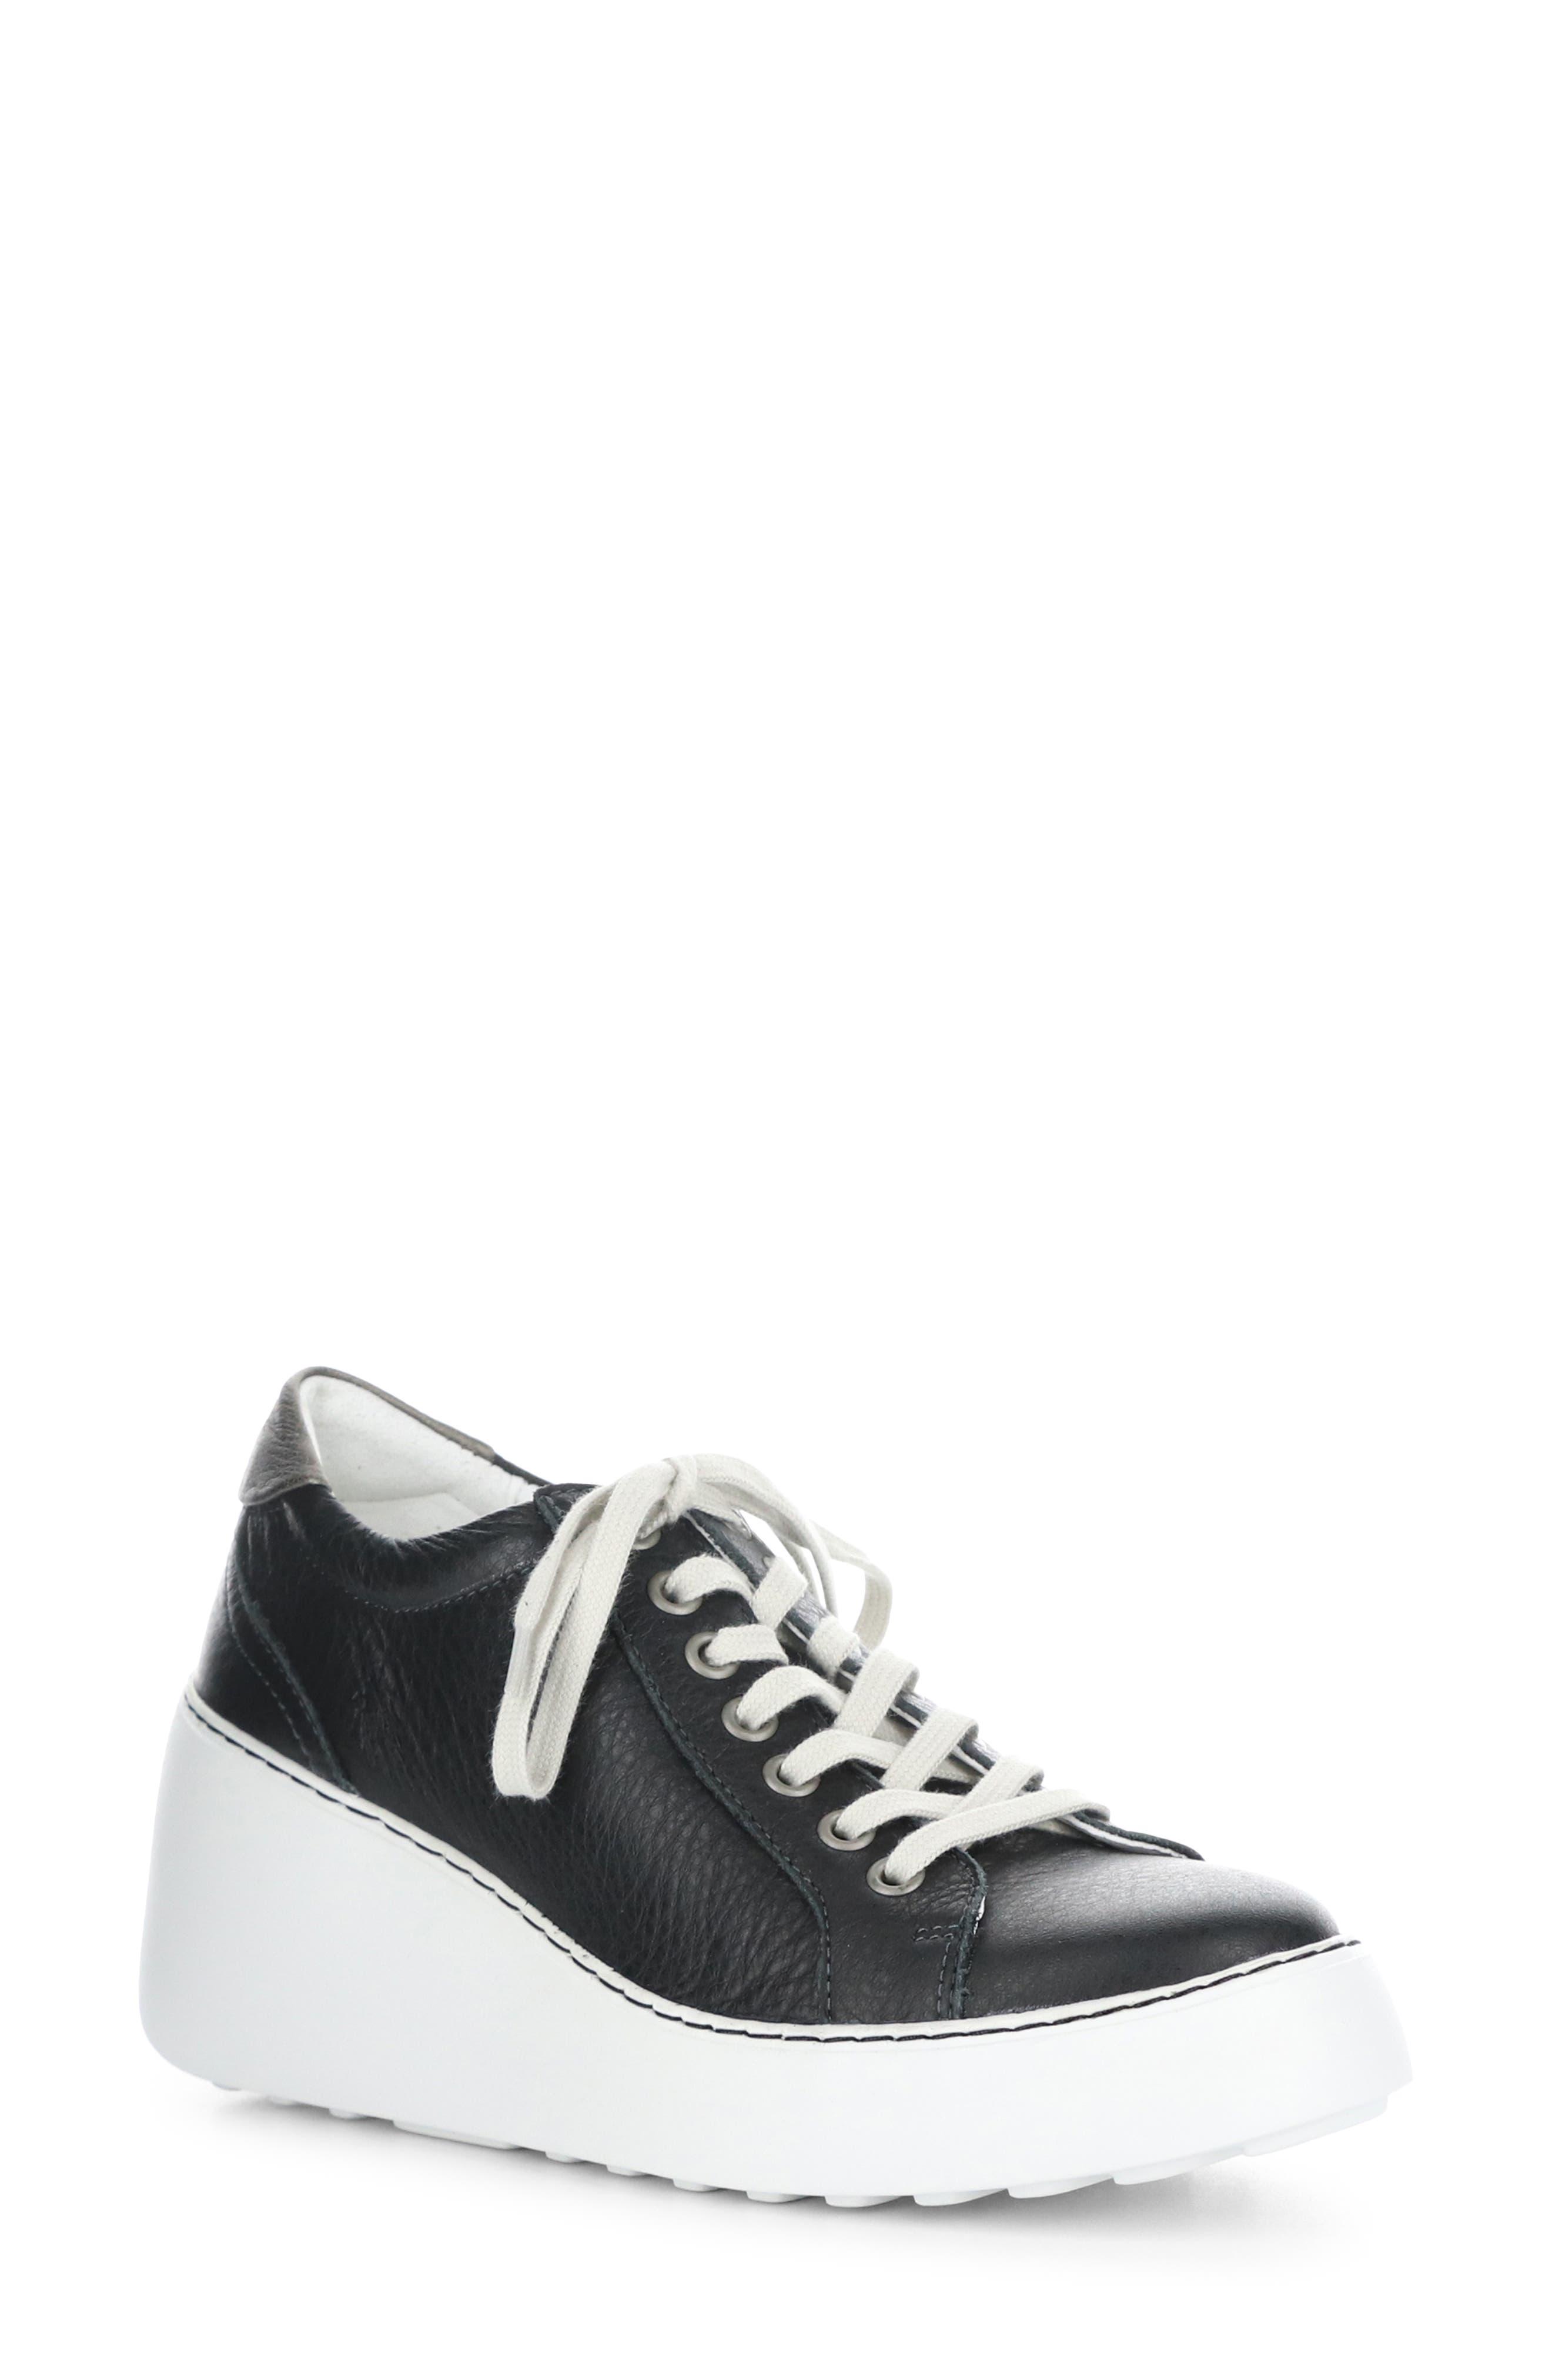 Dile Wedge Sneaker